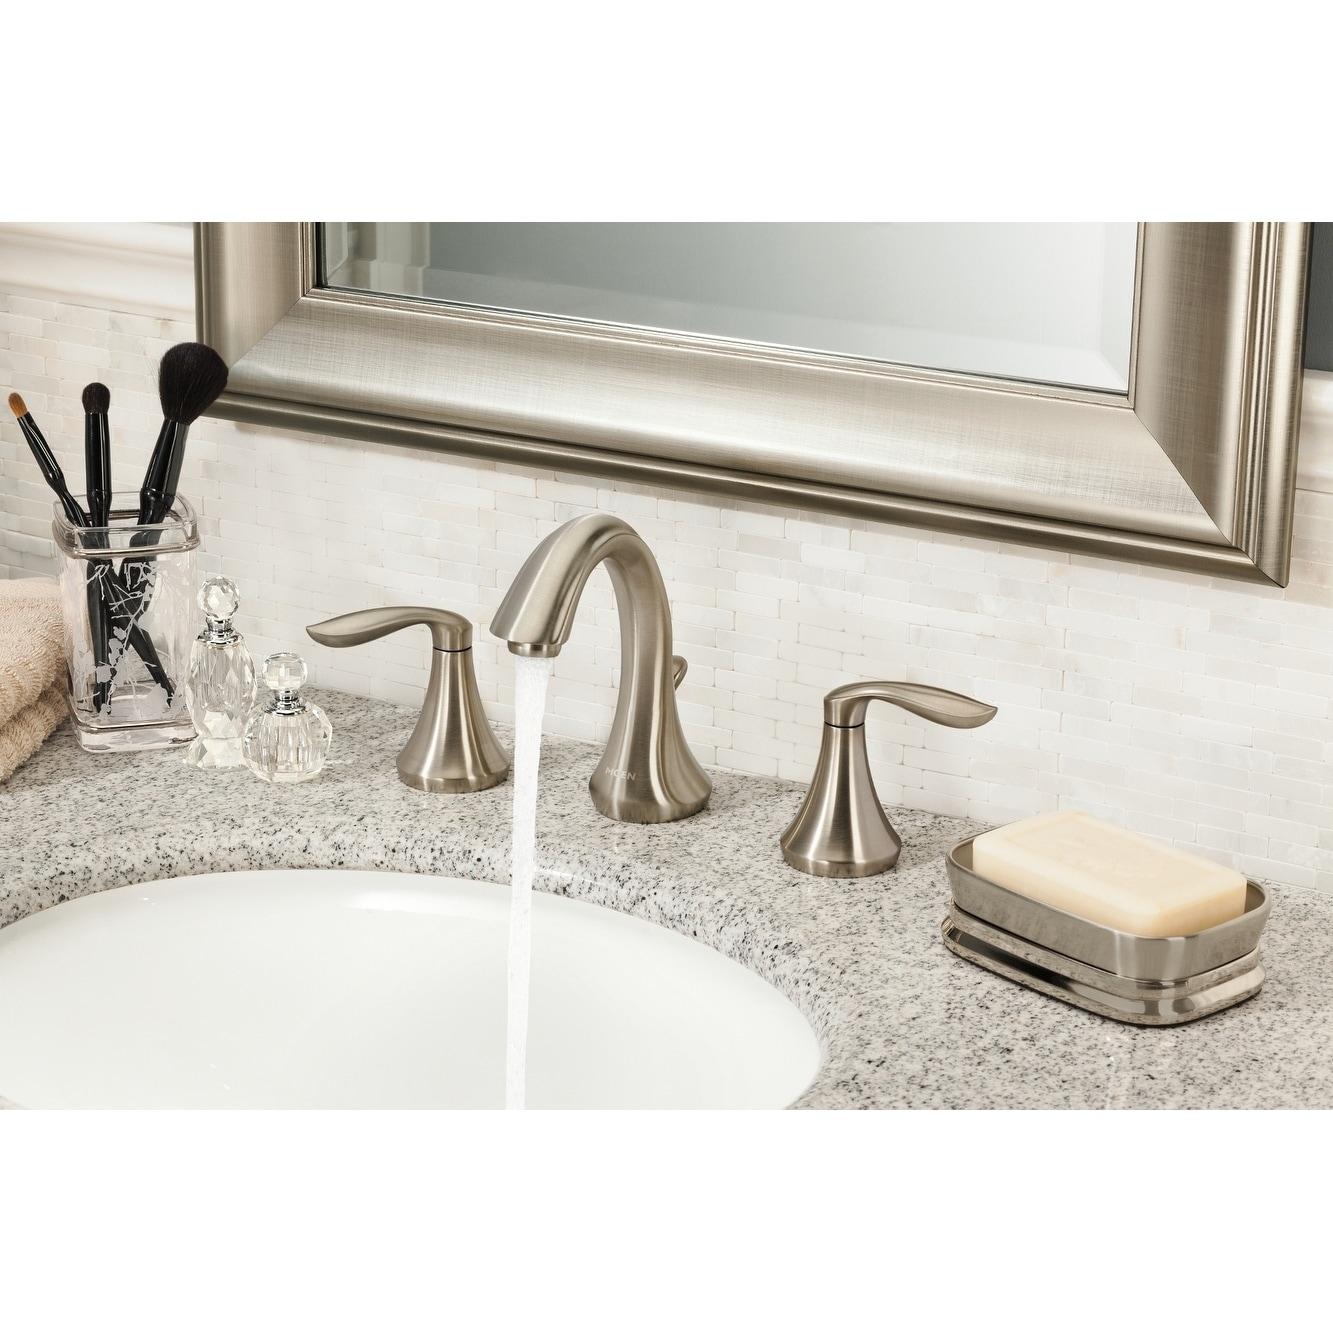 Shop Moen Eva Two-Handle High Arc Bathroom Faucet Trim T6420BN ...